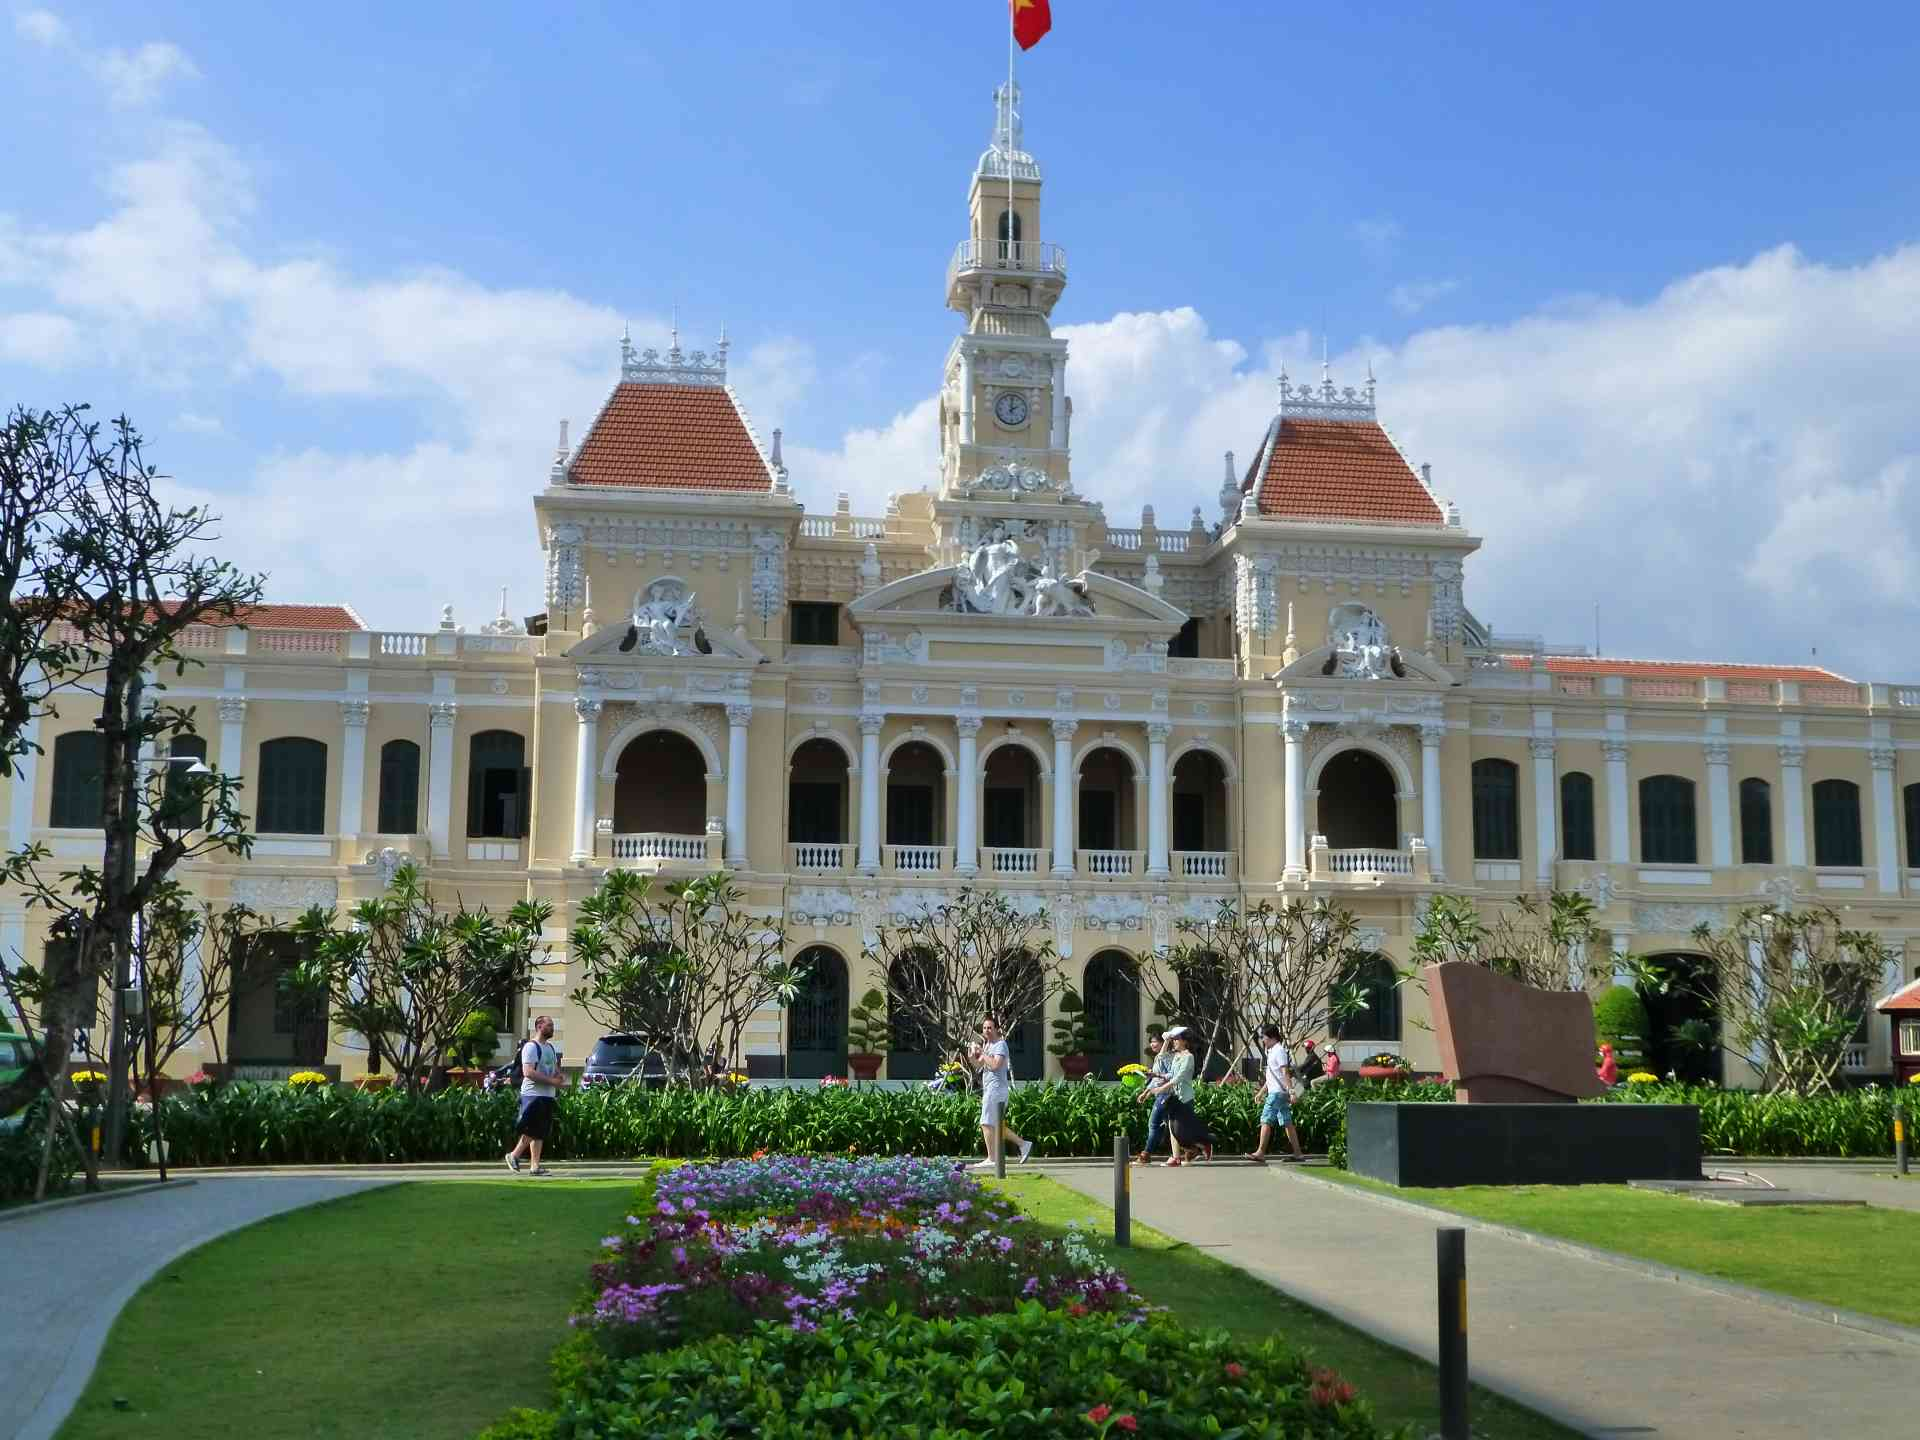 Saigon City Hall, Vietnam by Marion Bunnik